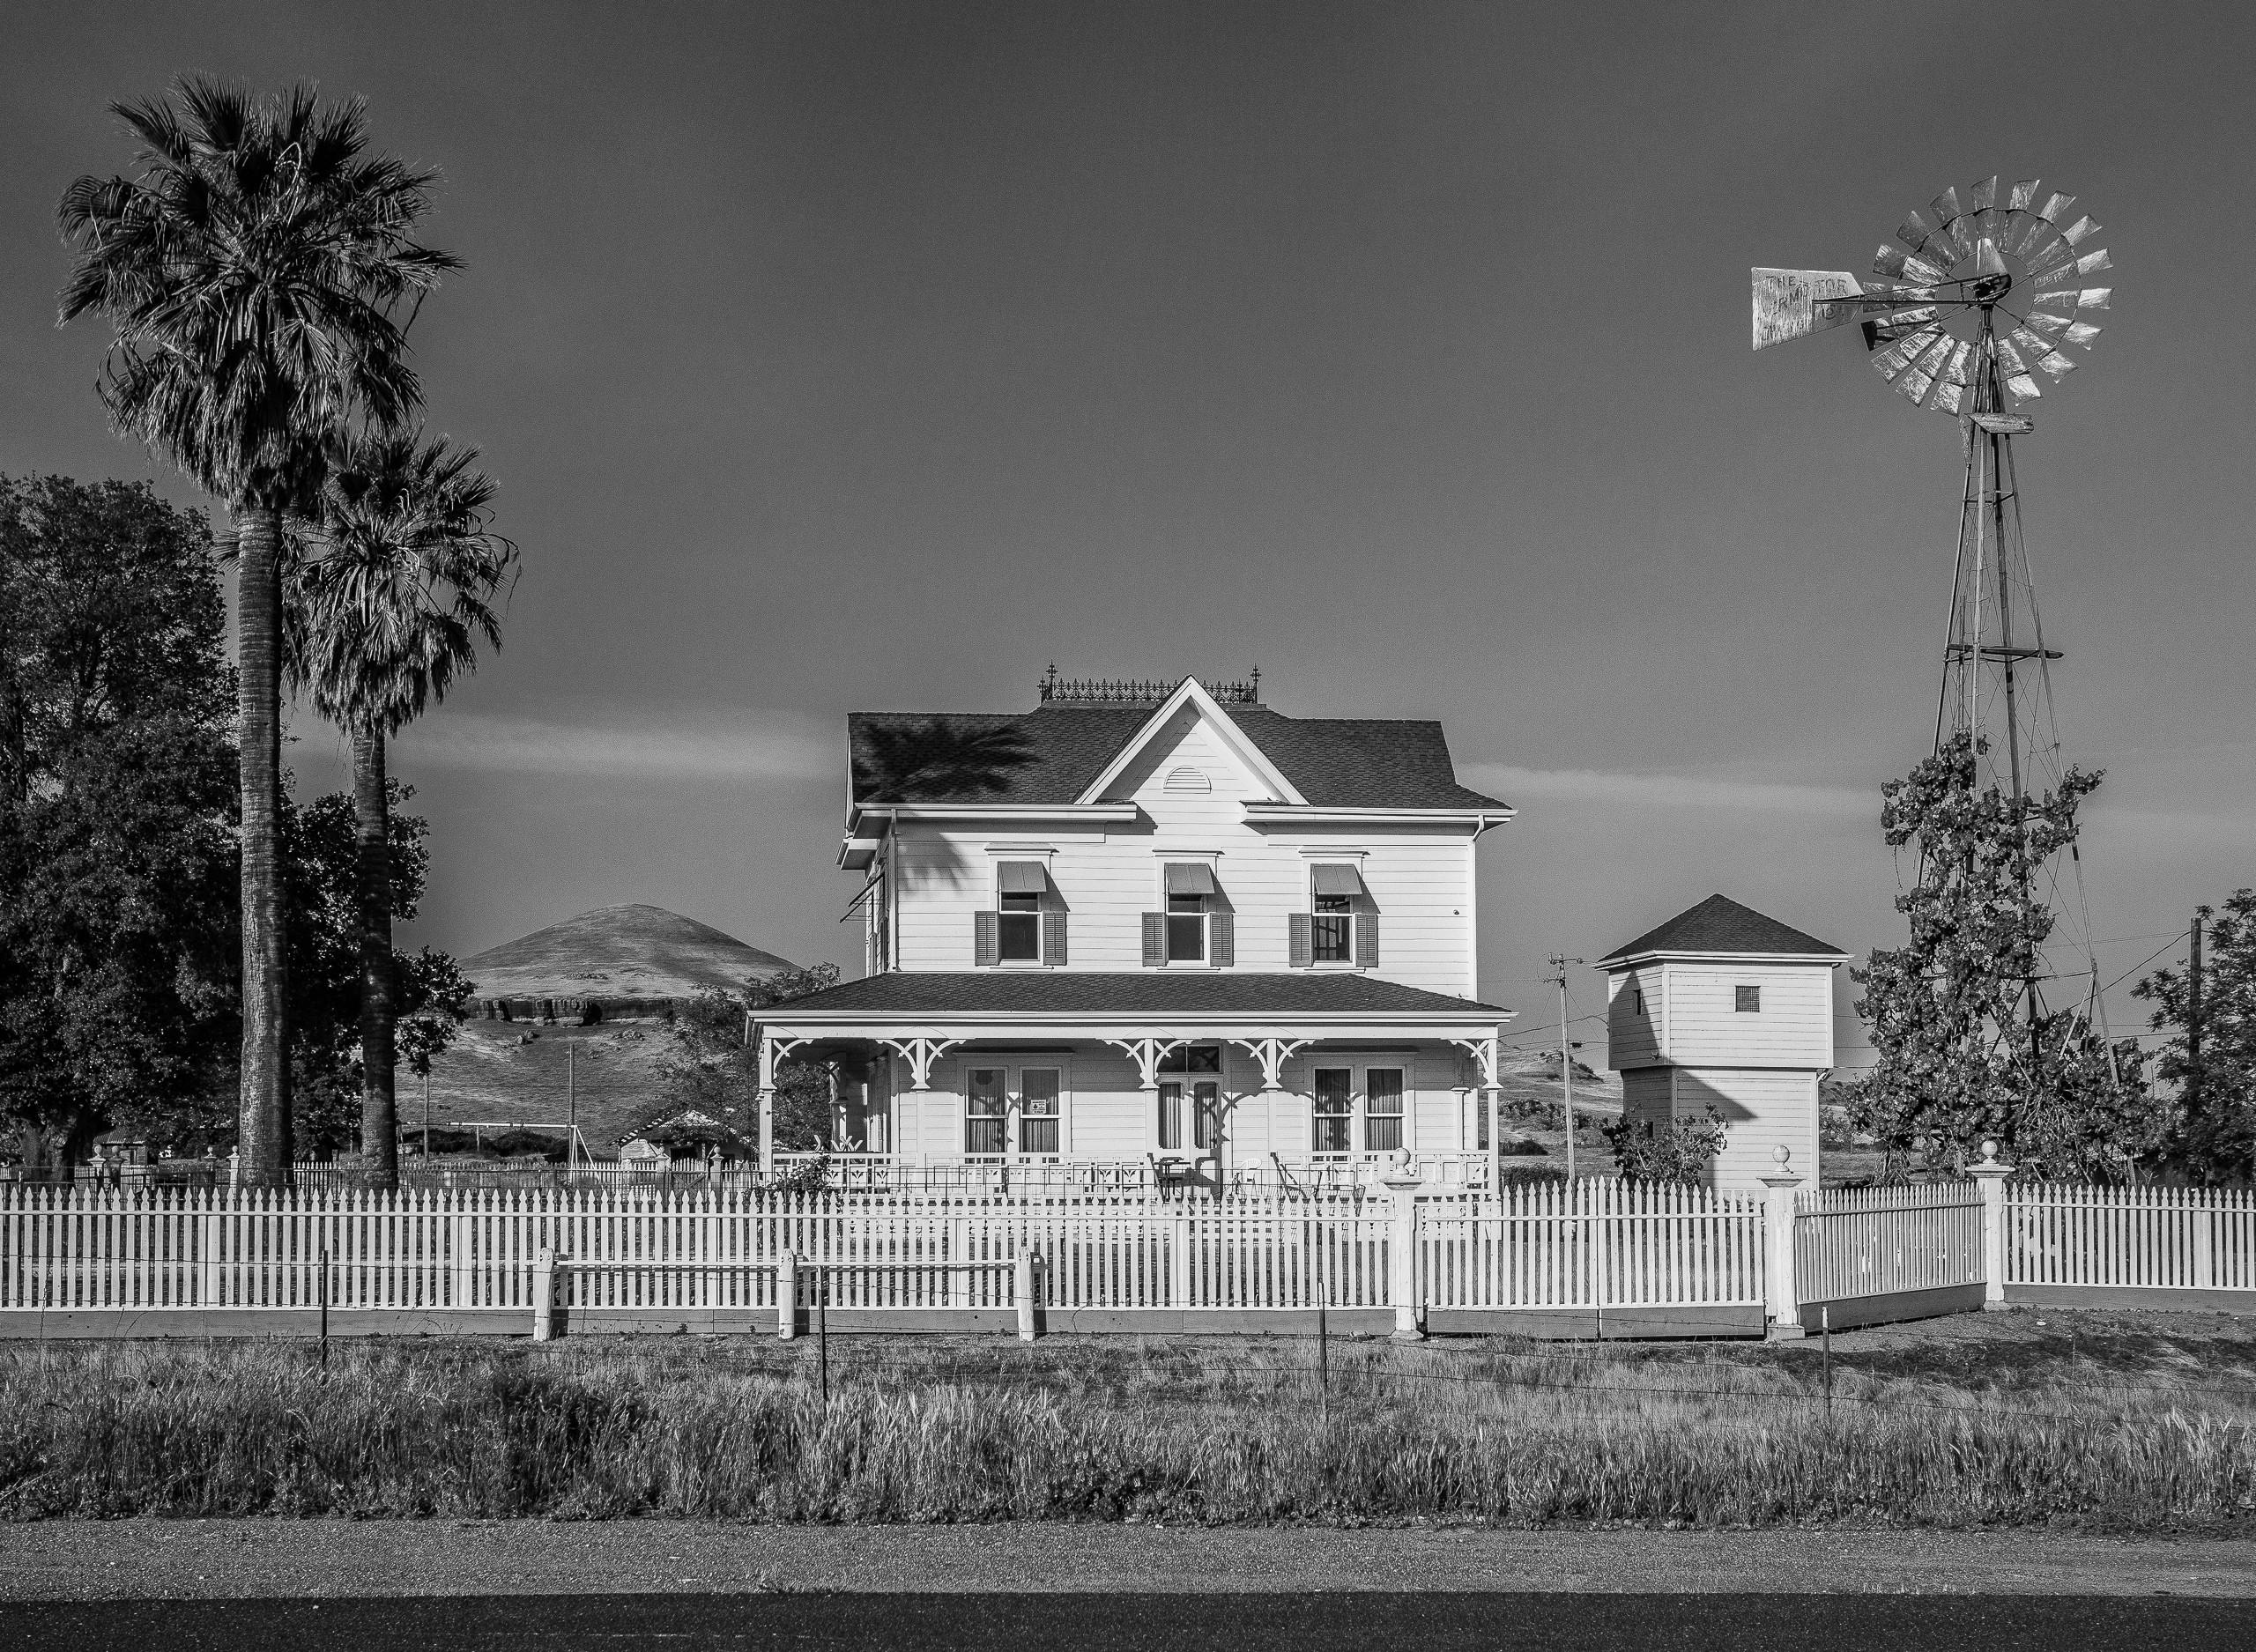 Willms' Homestead